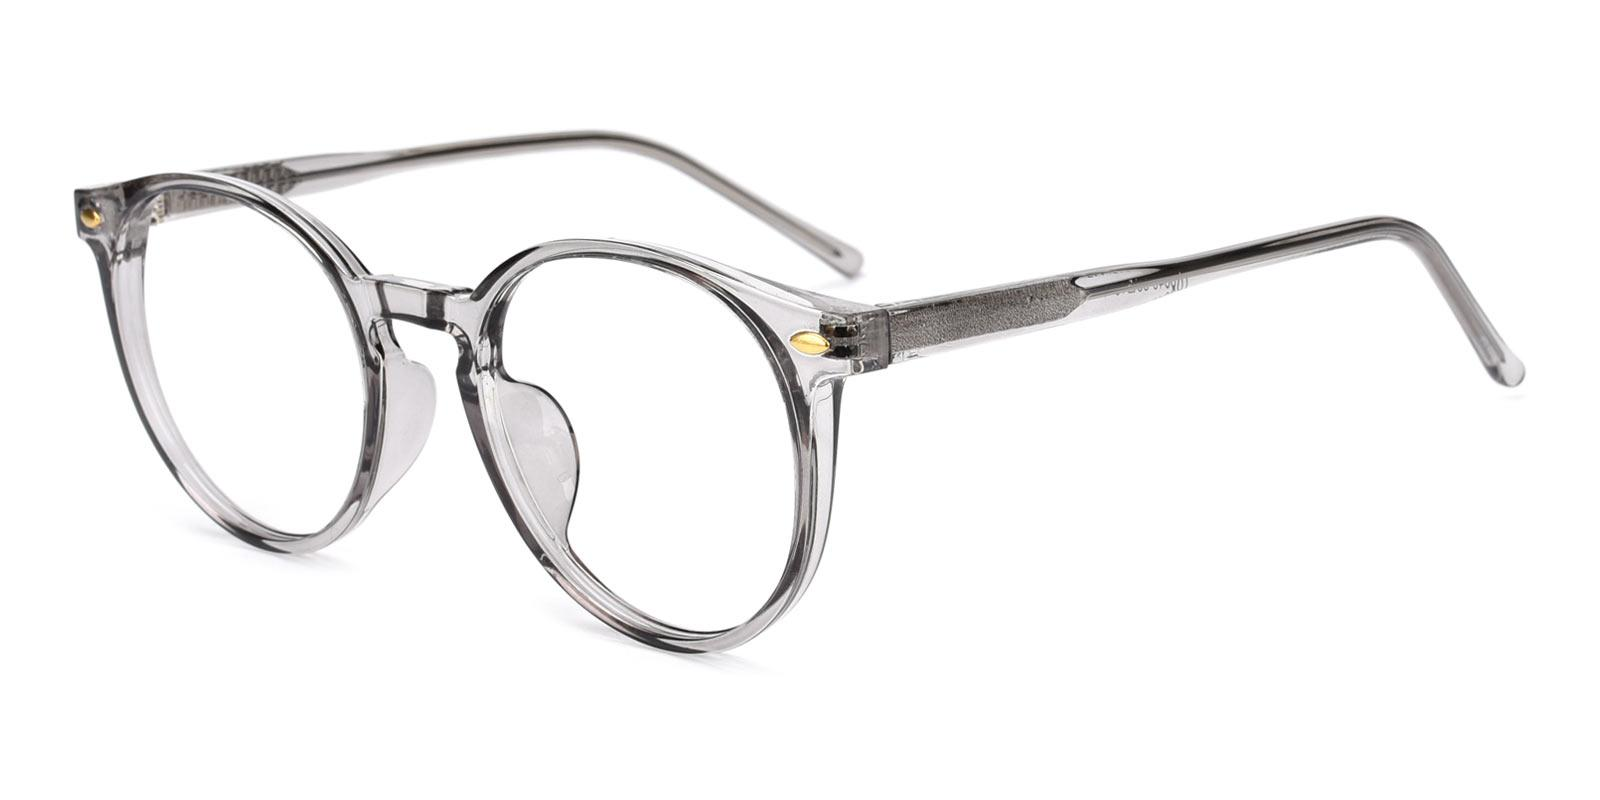 Cain-Gray-Round-TR-Eyeglasses-detail